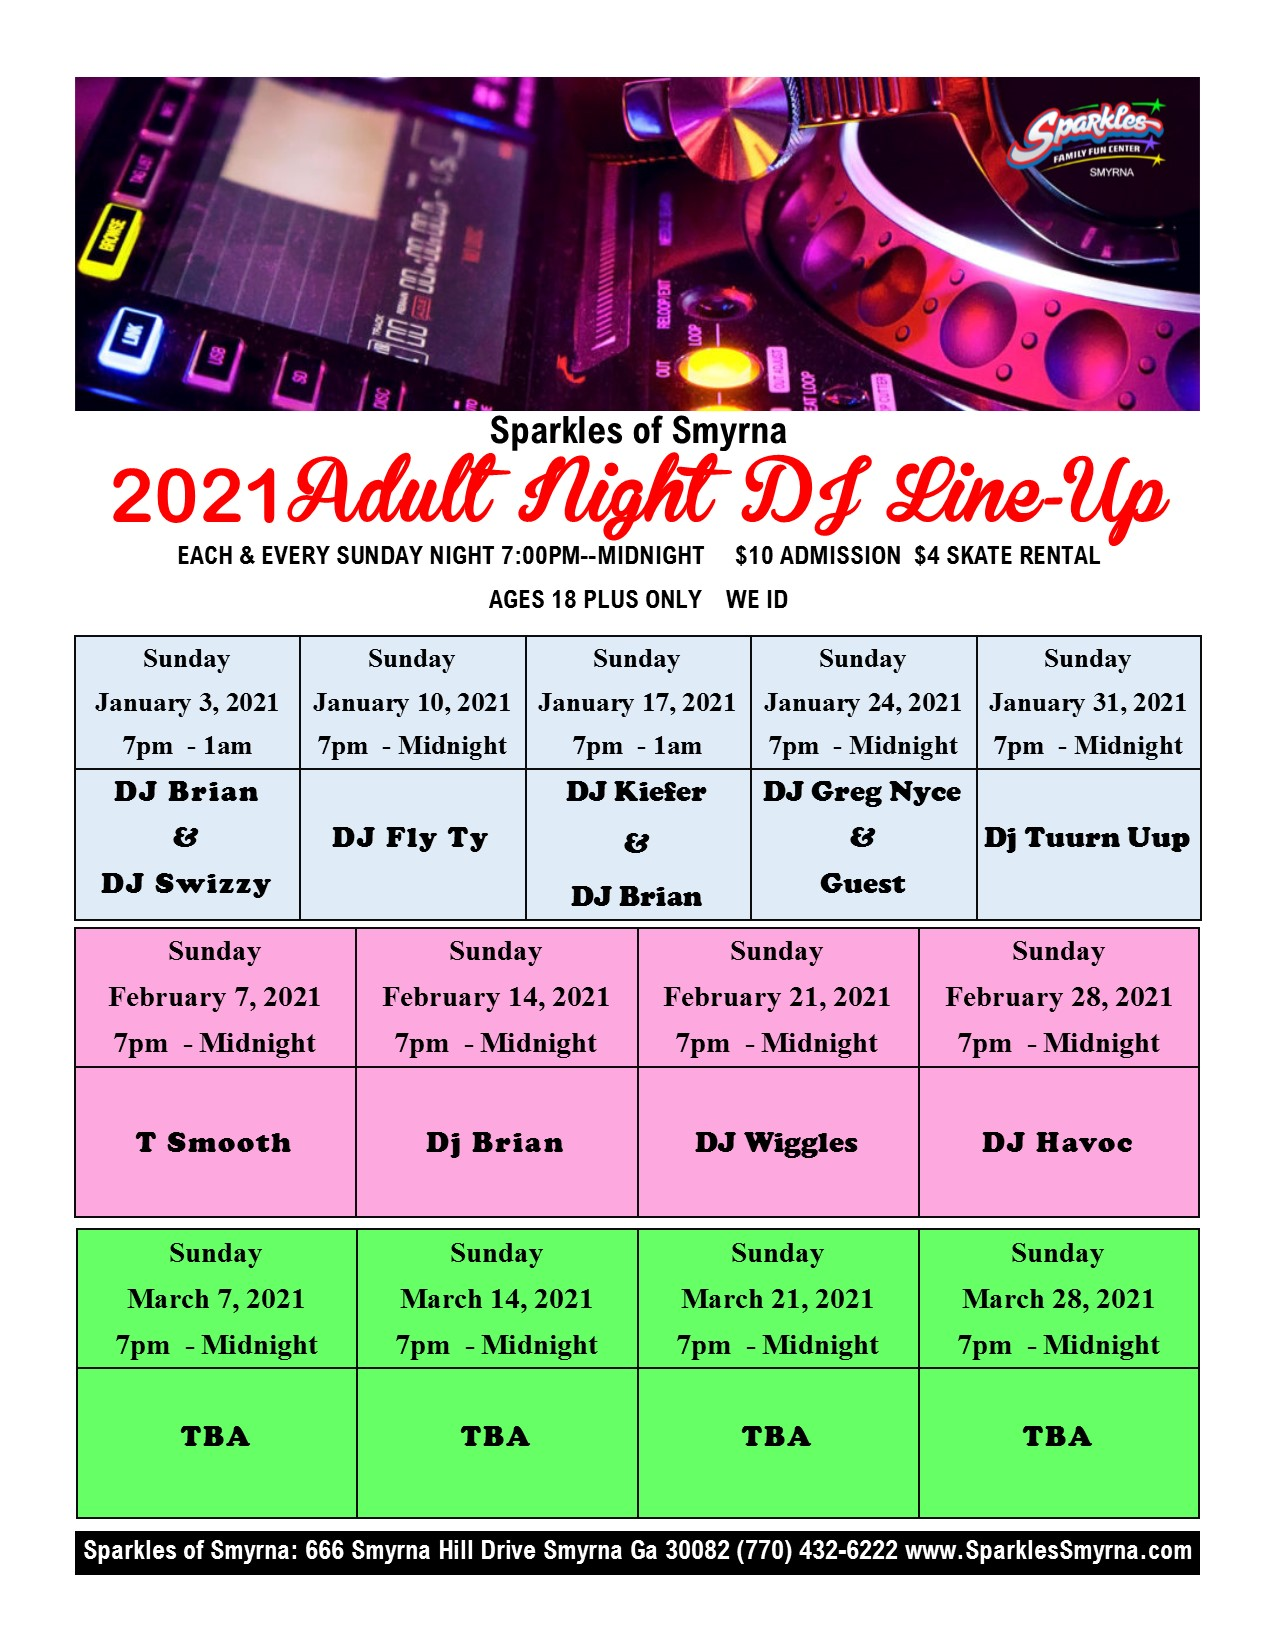 Sunday Night Adult Nigh DJ Schedule